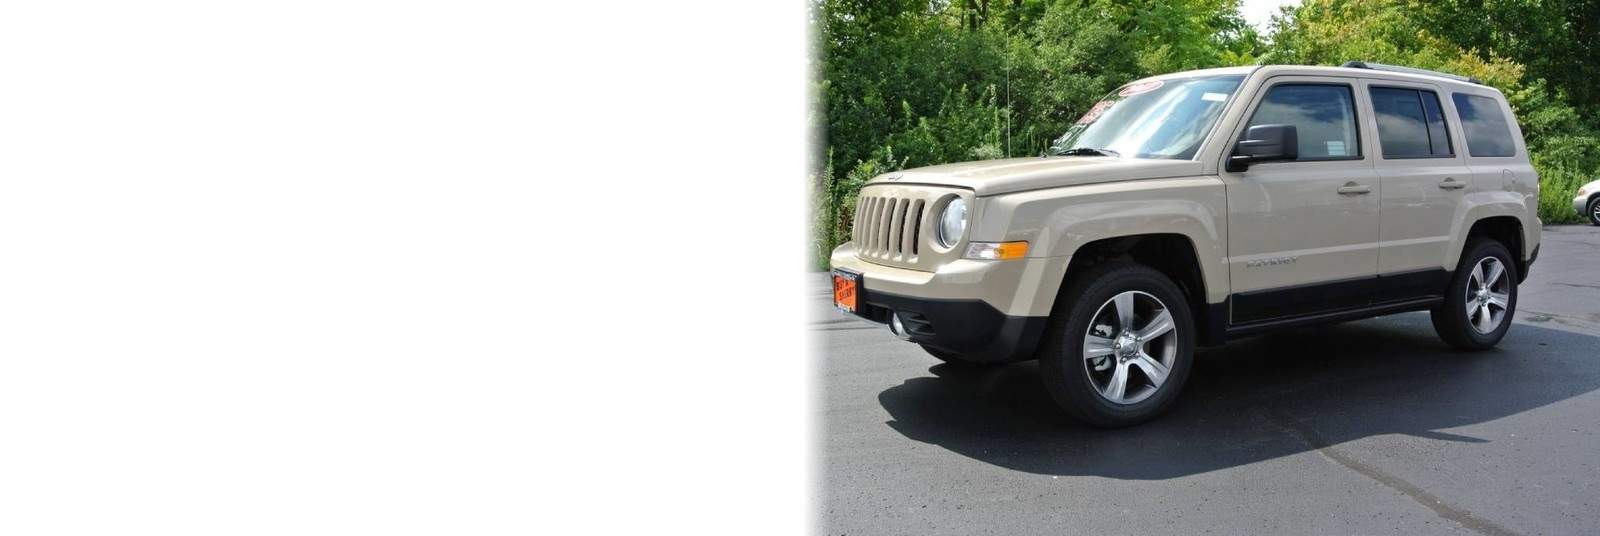 2014-jeep-patriot-high-altitude-27723T-2